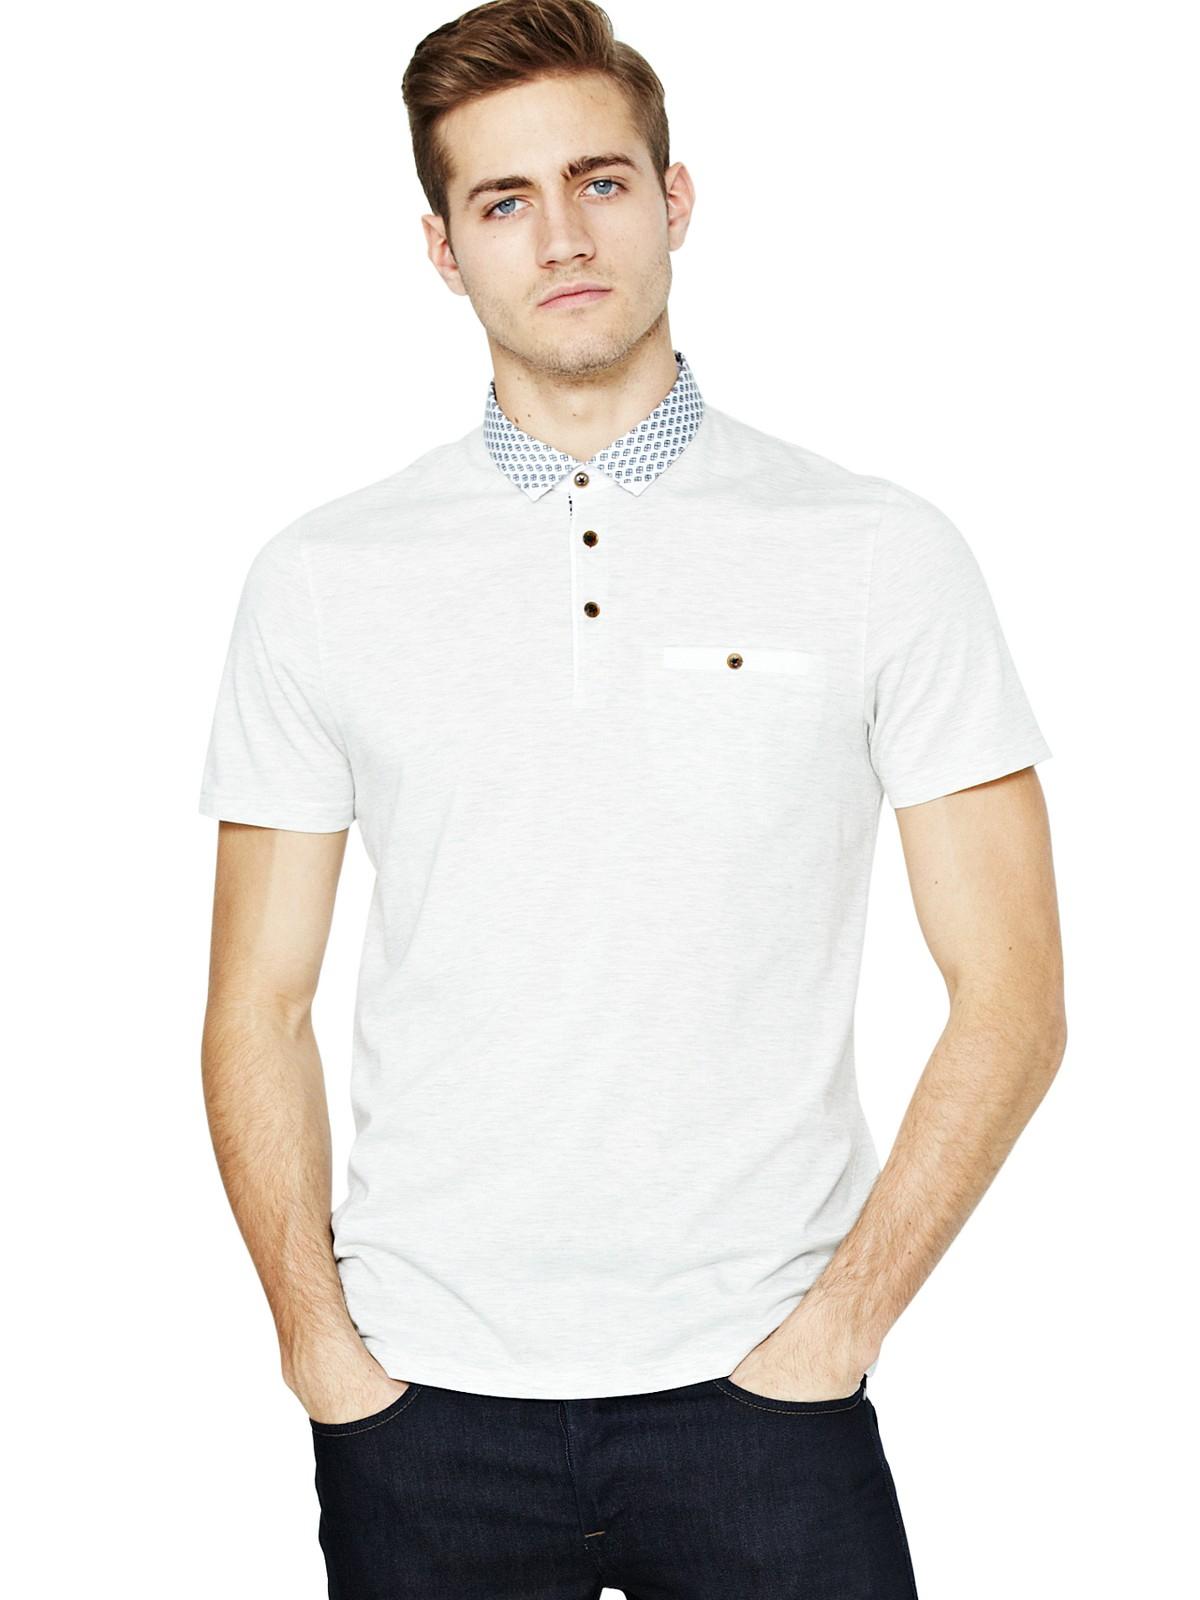 Ted baker ted baker mens woven collar polo shirt in white for Ted baker mens polo shirts